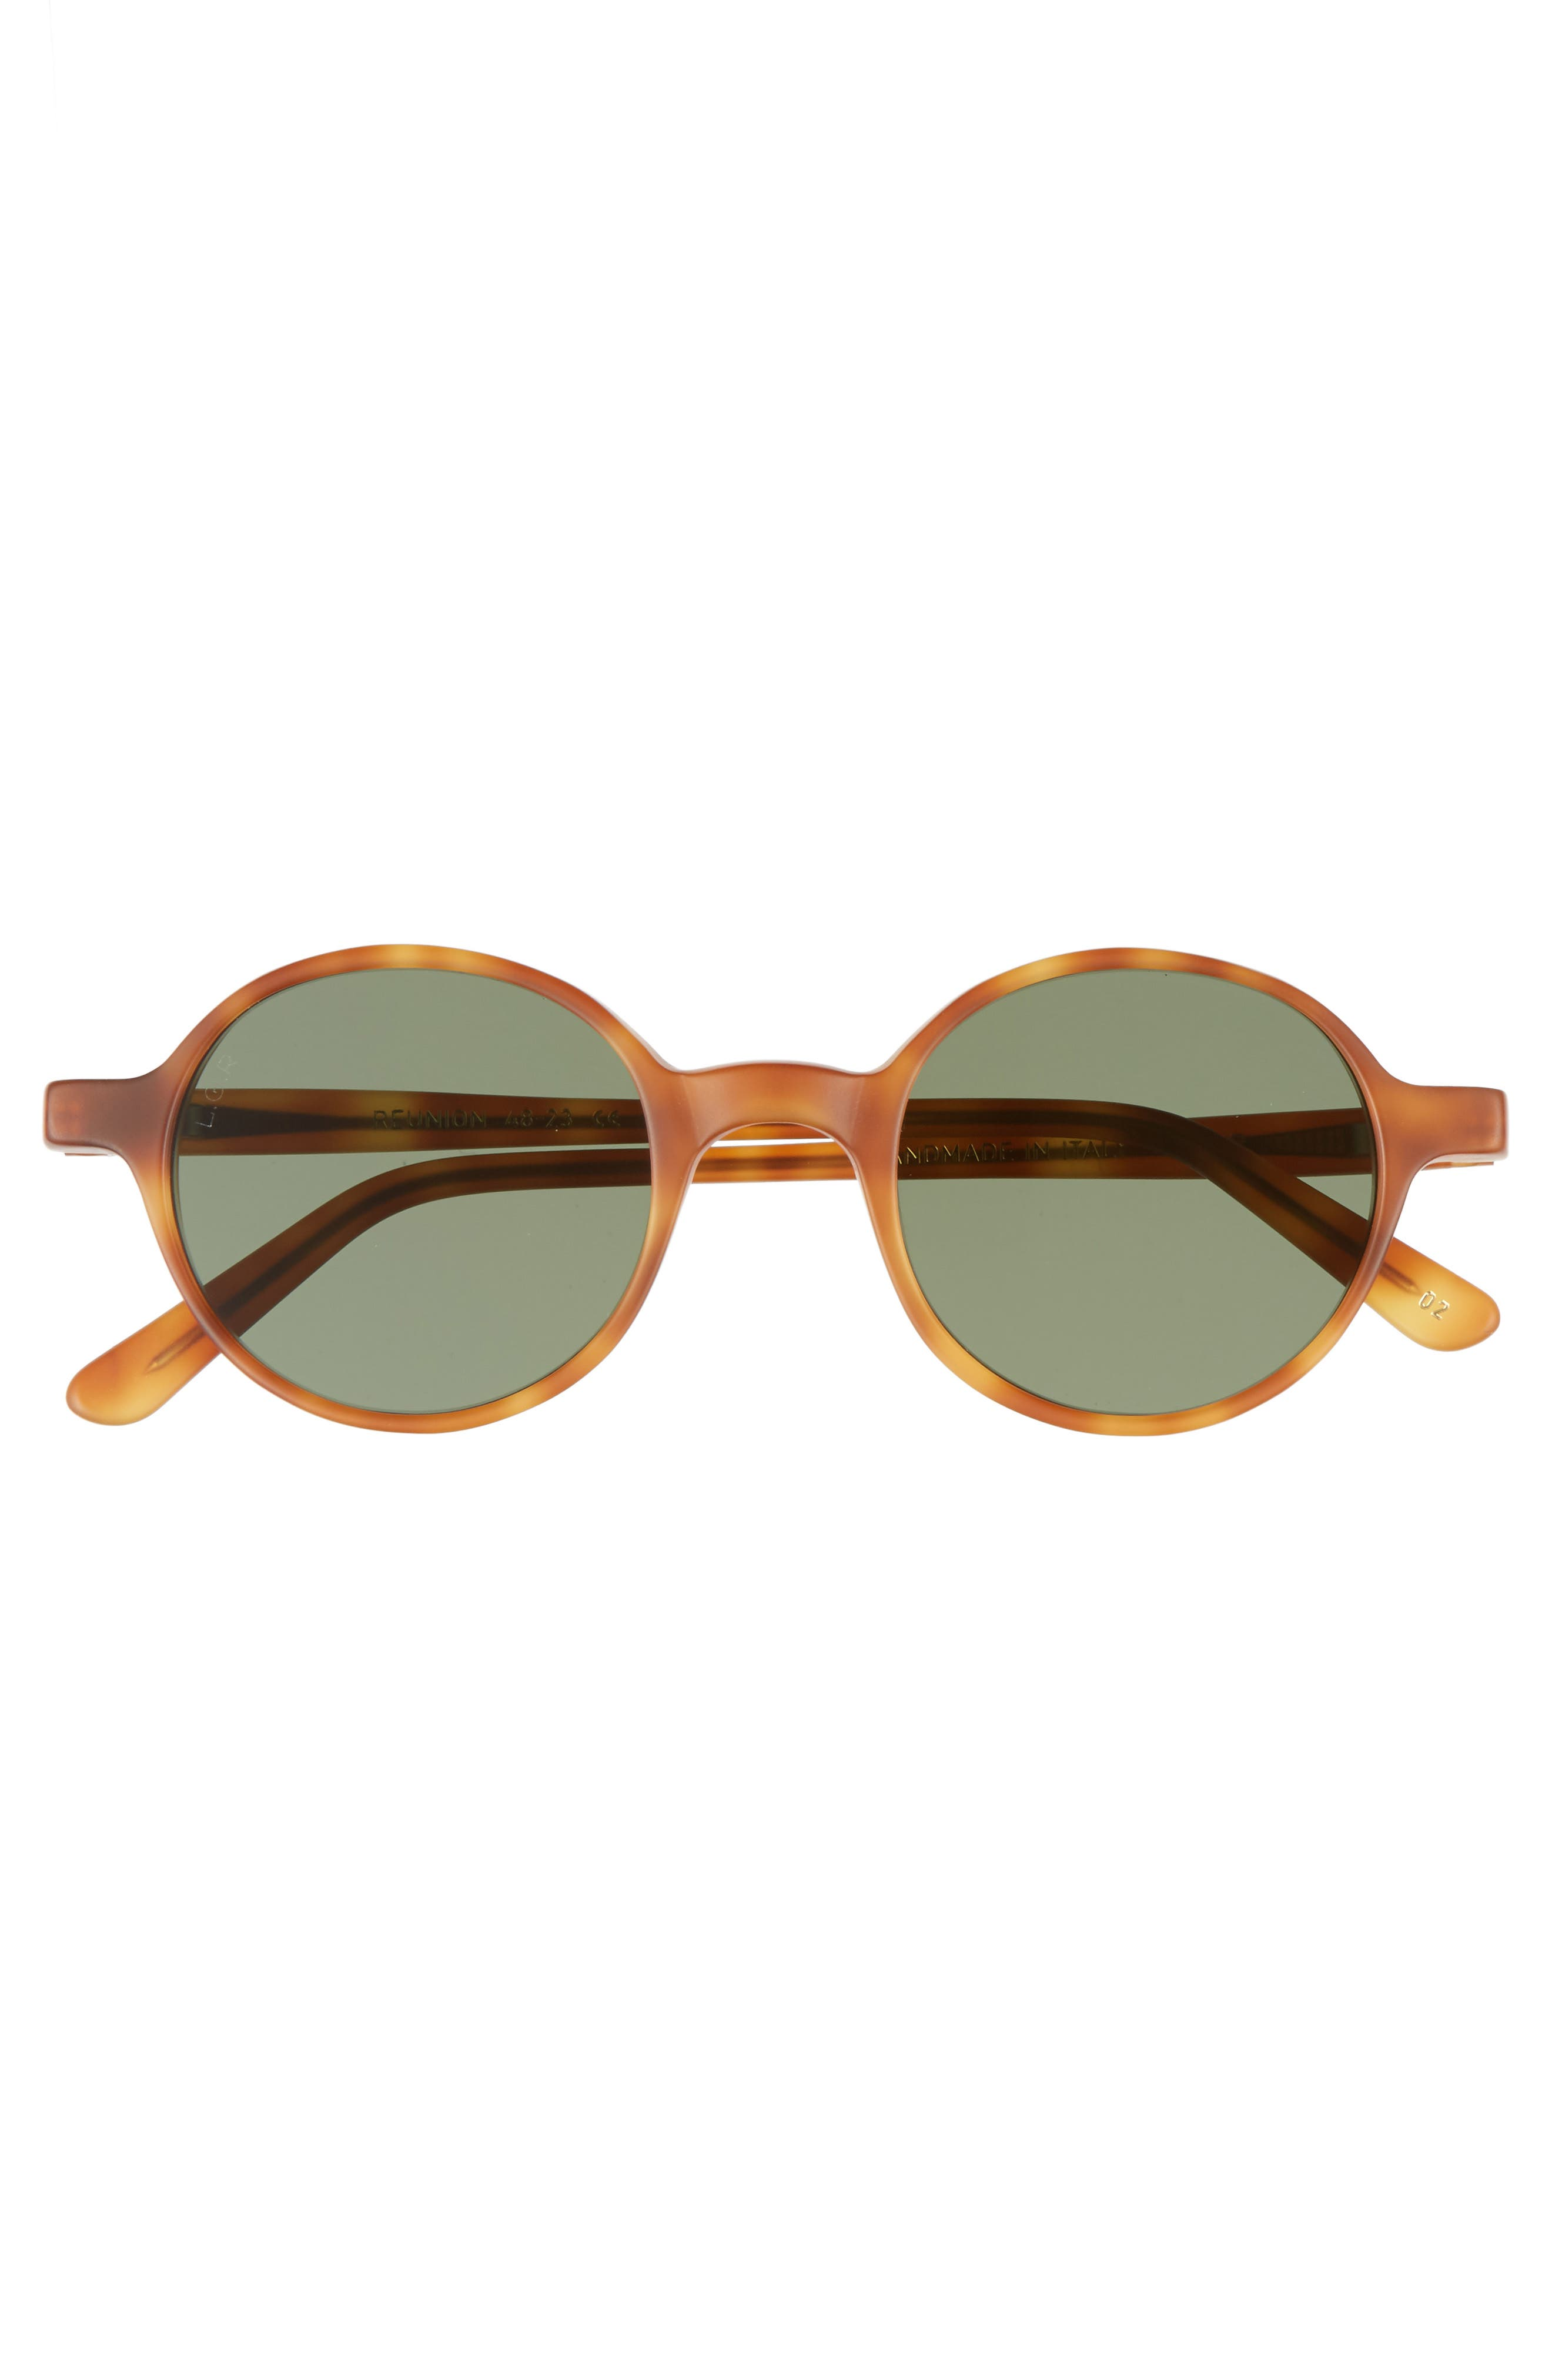 Reunion 48mm Sunglasses,                             Alternate thumbnail 2, color,                             Havana Chiaro